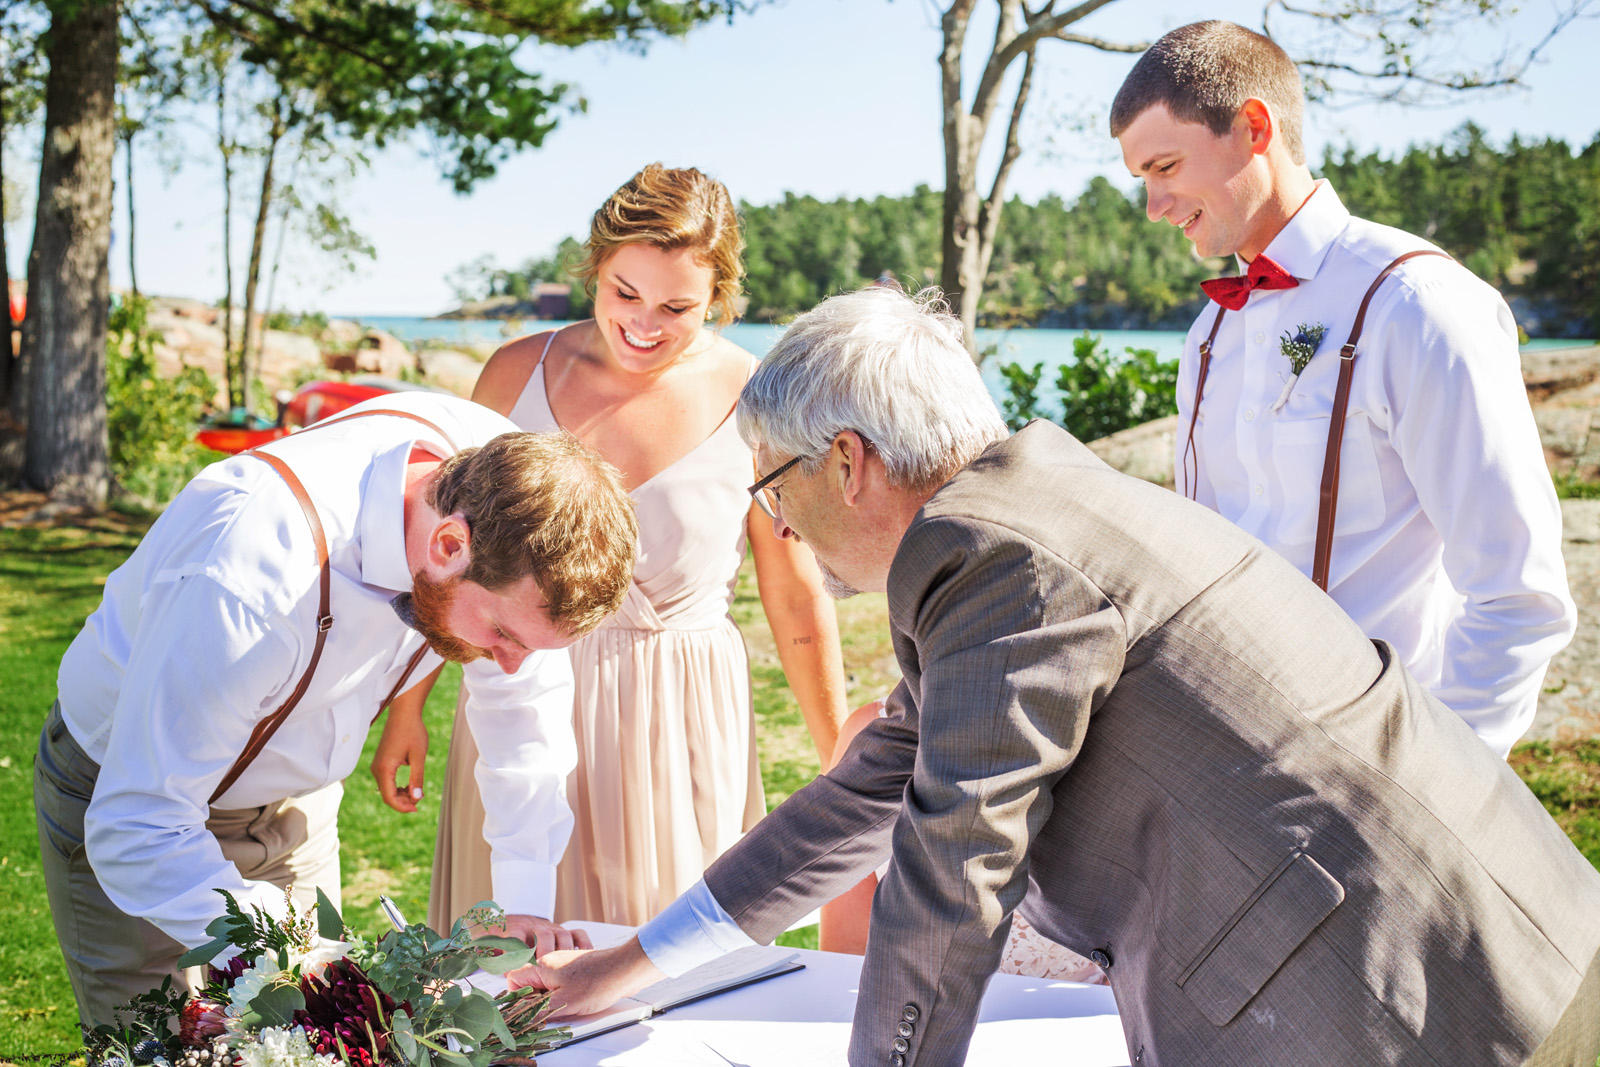 harris_wedding-1778.jpg